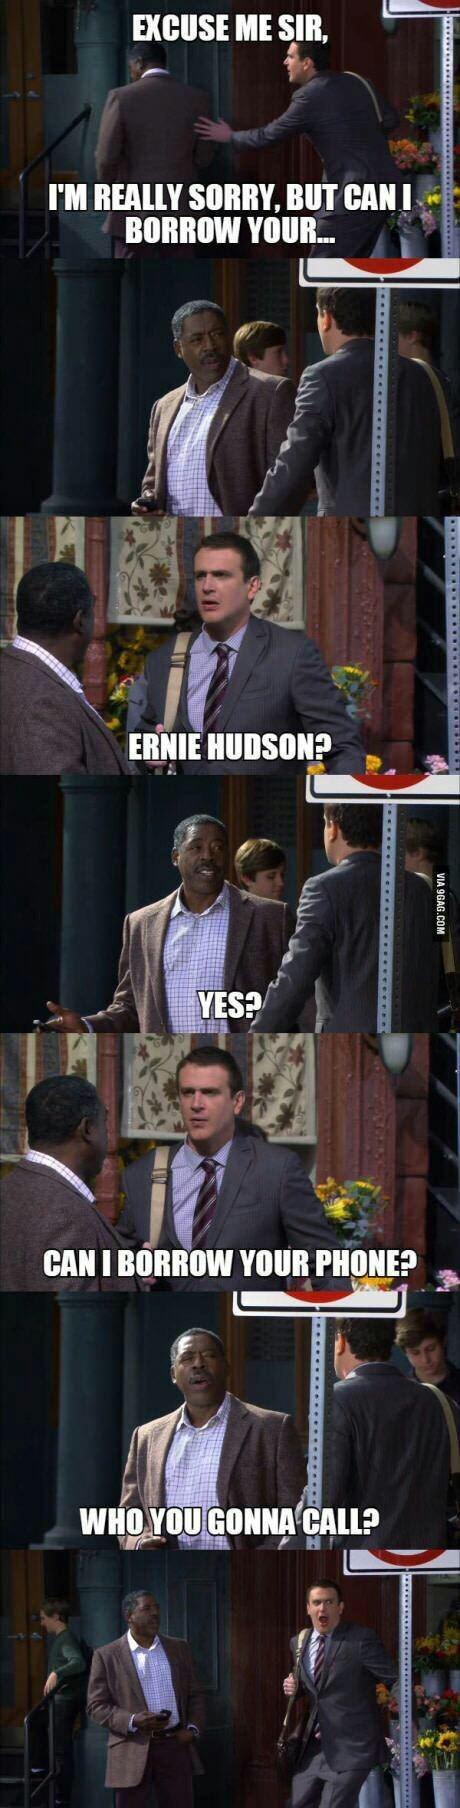 meme - Suit - EXCUSE ME SIR, I'M REALLY SORRY, BUT CANI BORROW YOUR.. ERNIE HUDSON? YES? CAN I BORROW YOUR PHONE? WHO YOU GONNA CALL? VIA 9GAG.COM